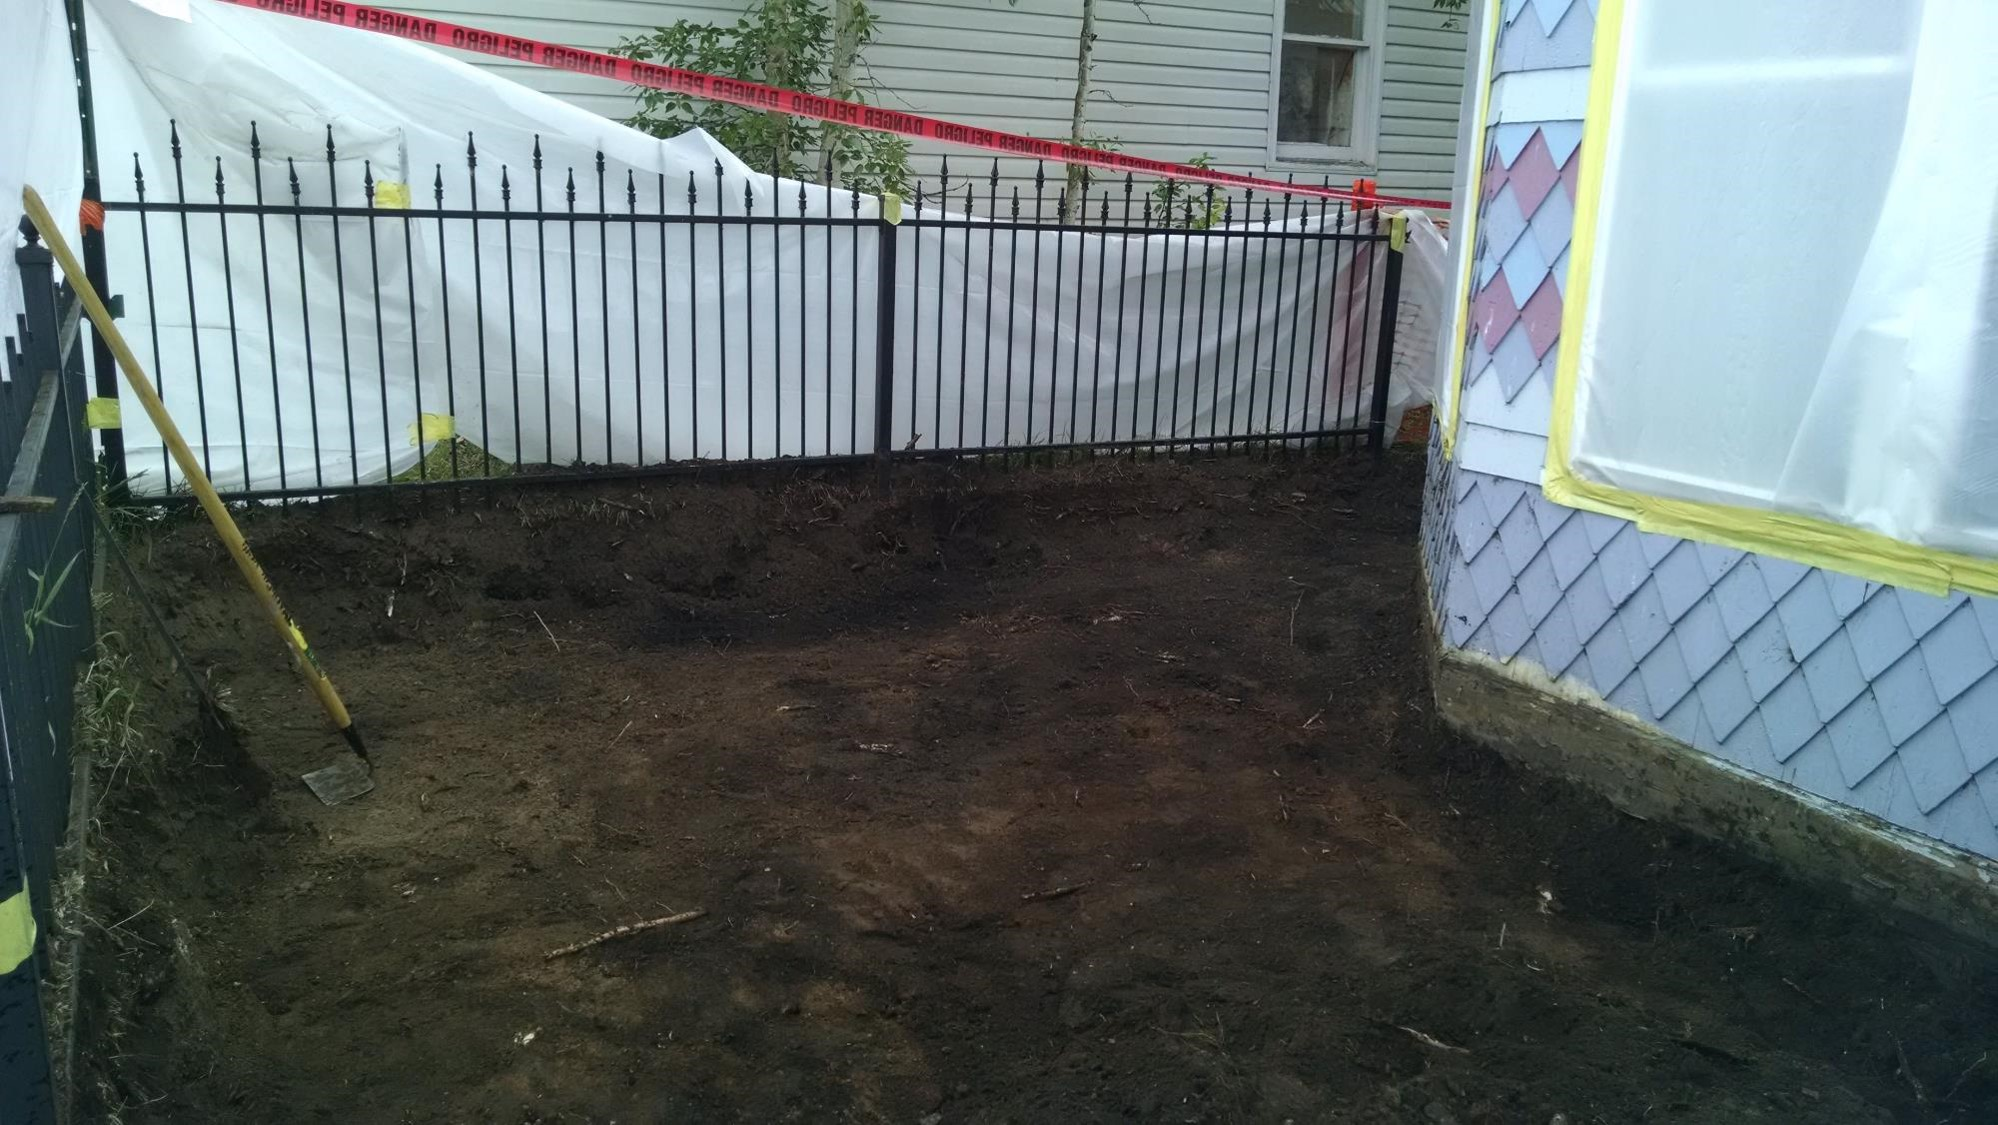 Removing contaminated soil